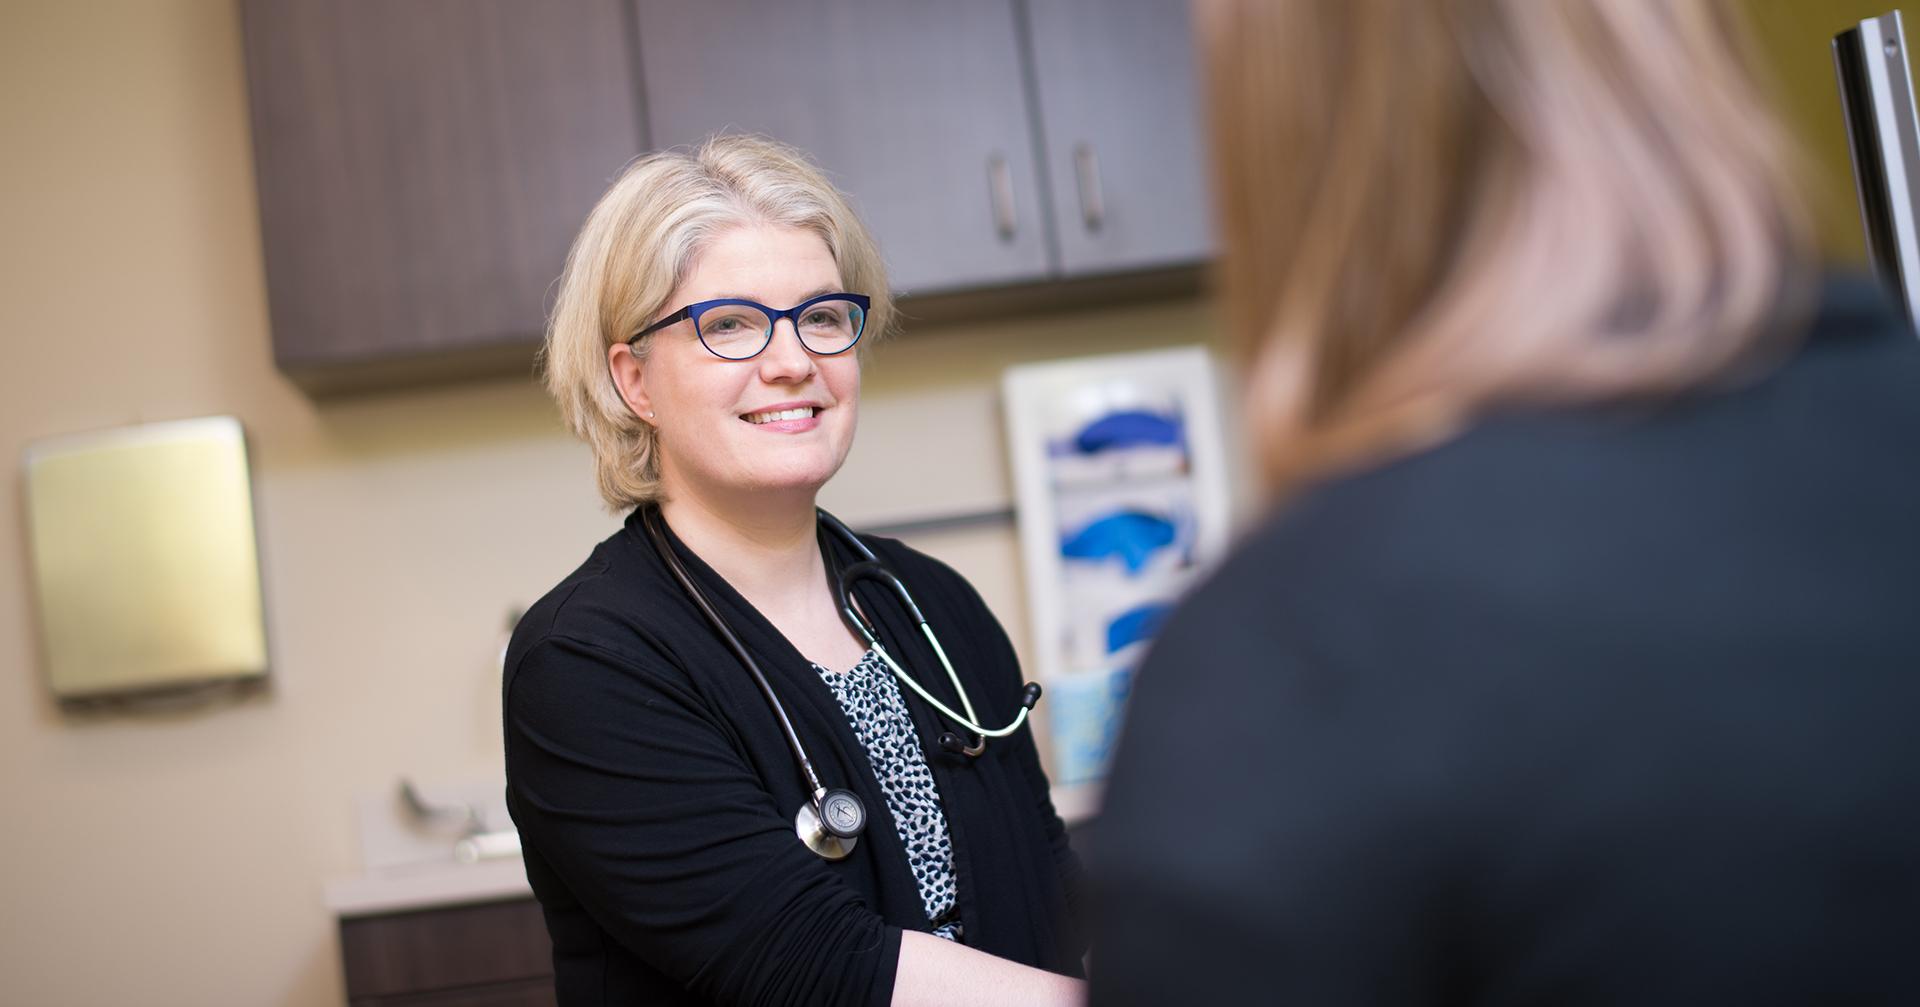 frequent-wellness-screenings